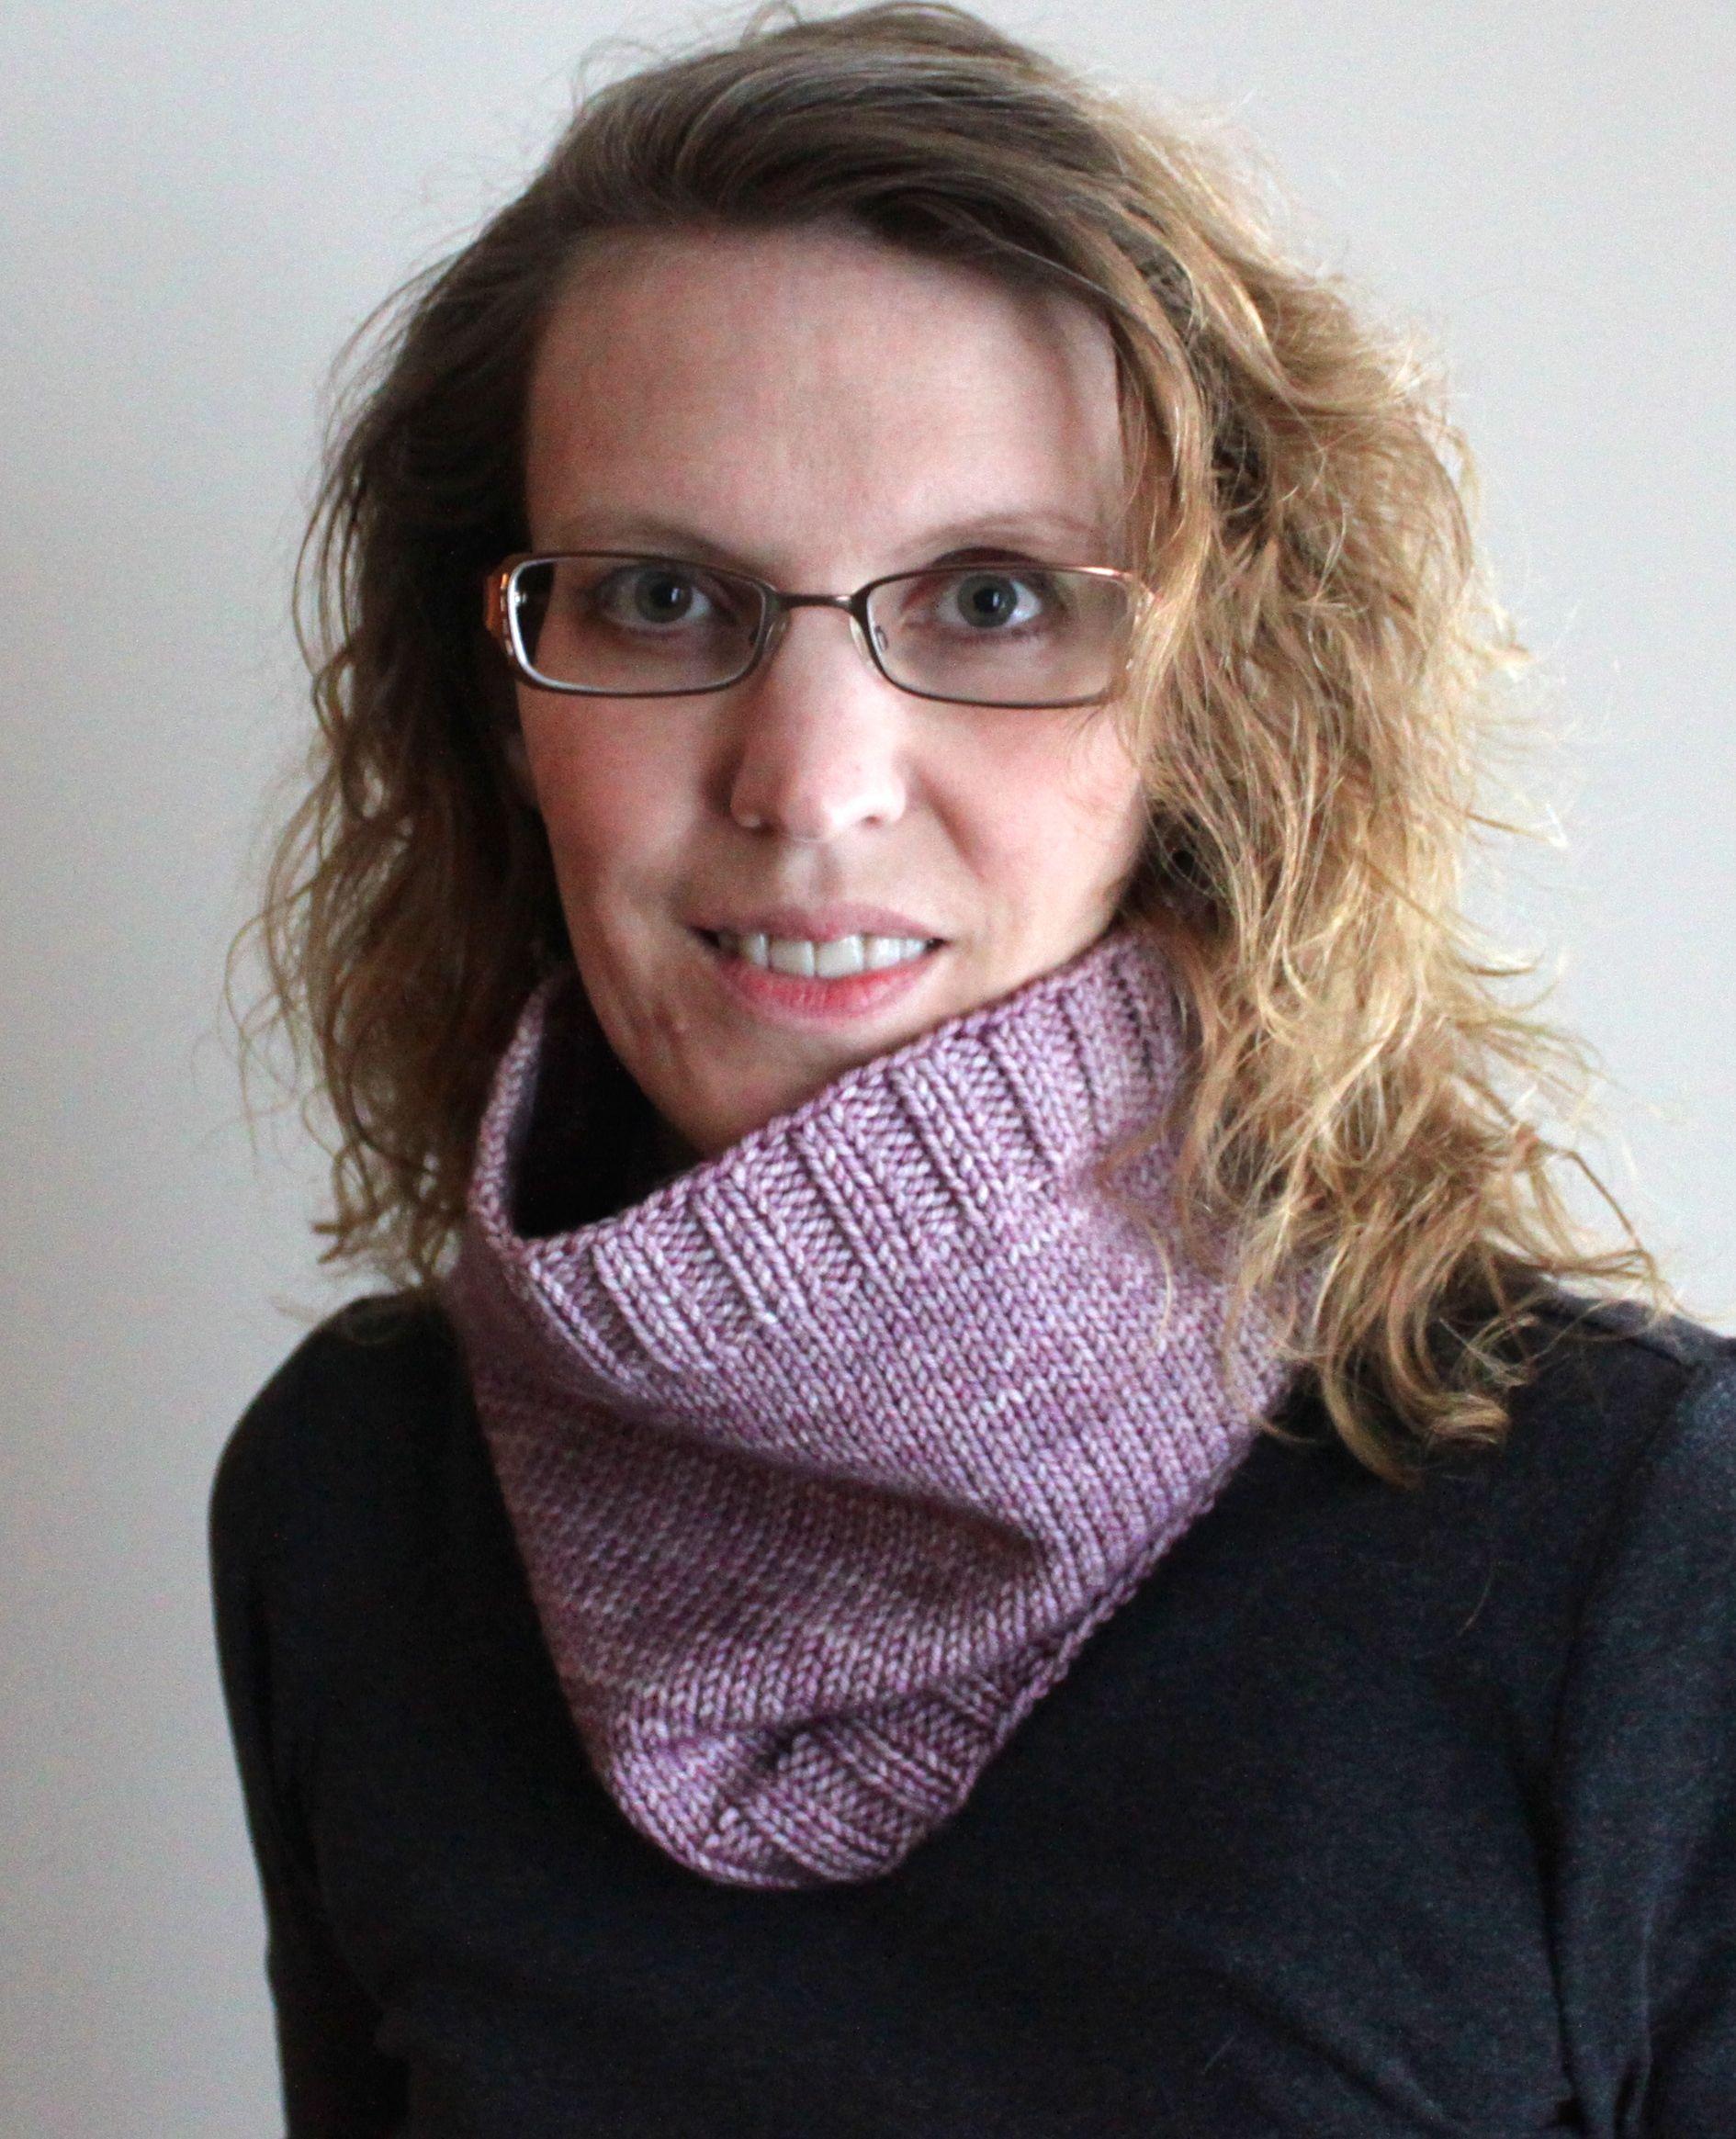 Free Knitting Patterns Sugar Plum Cowl Leah Michelle Designs